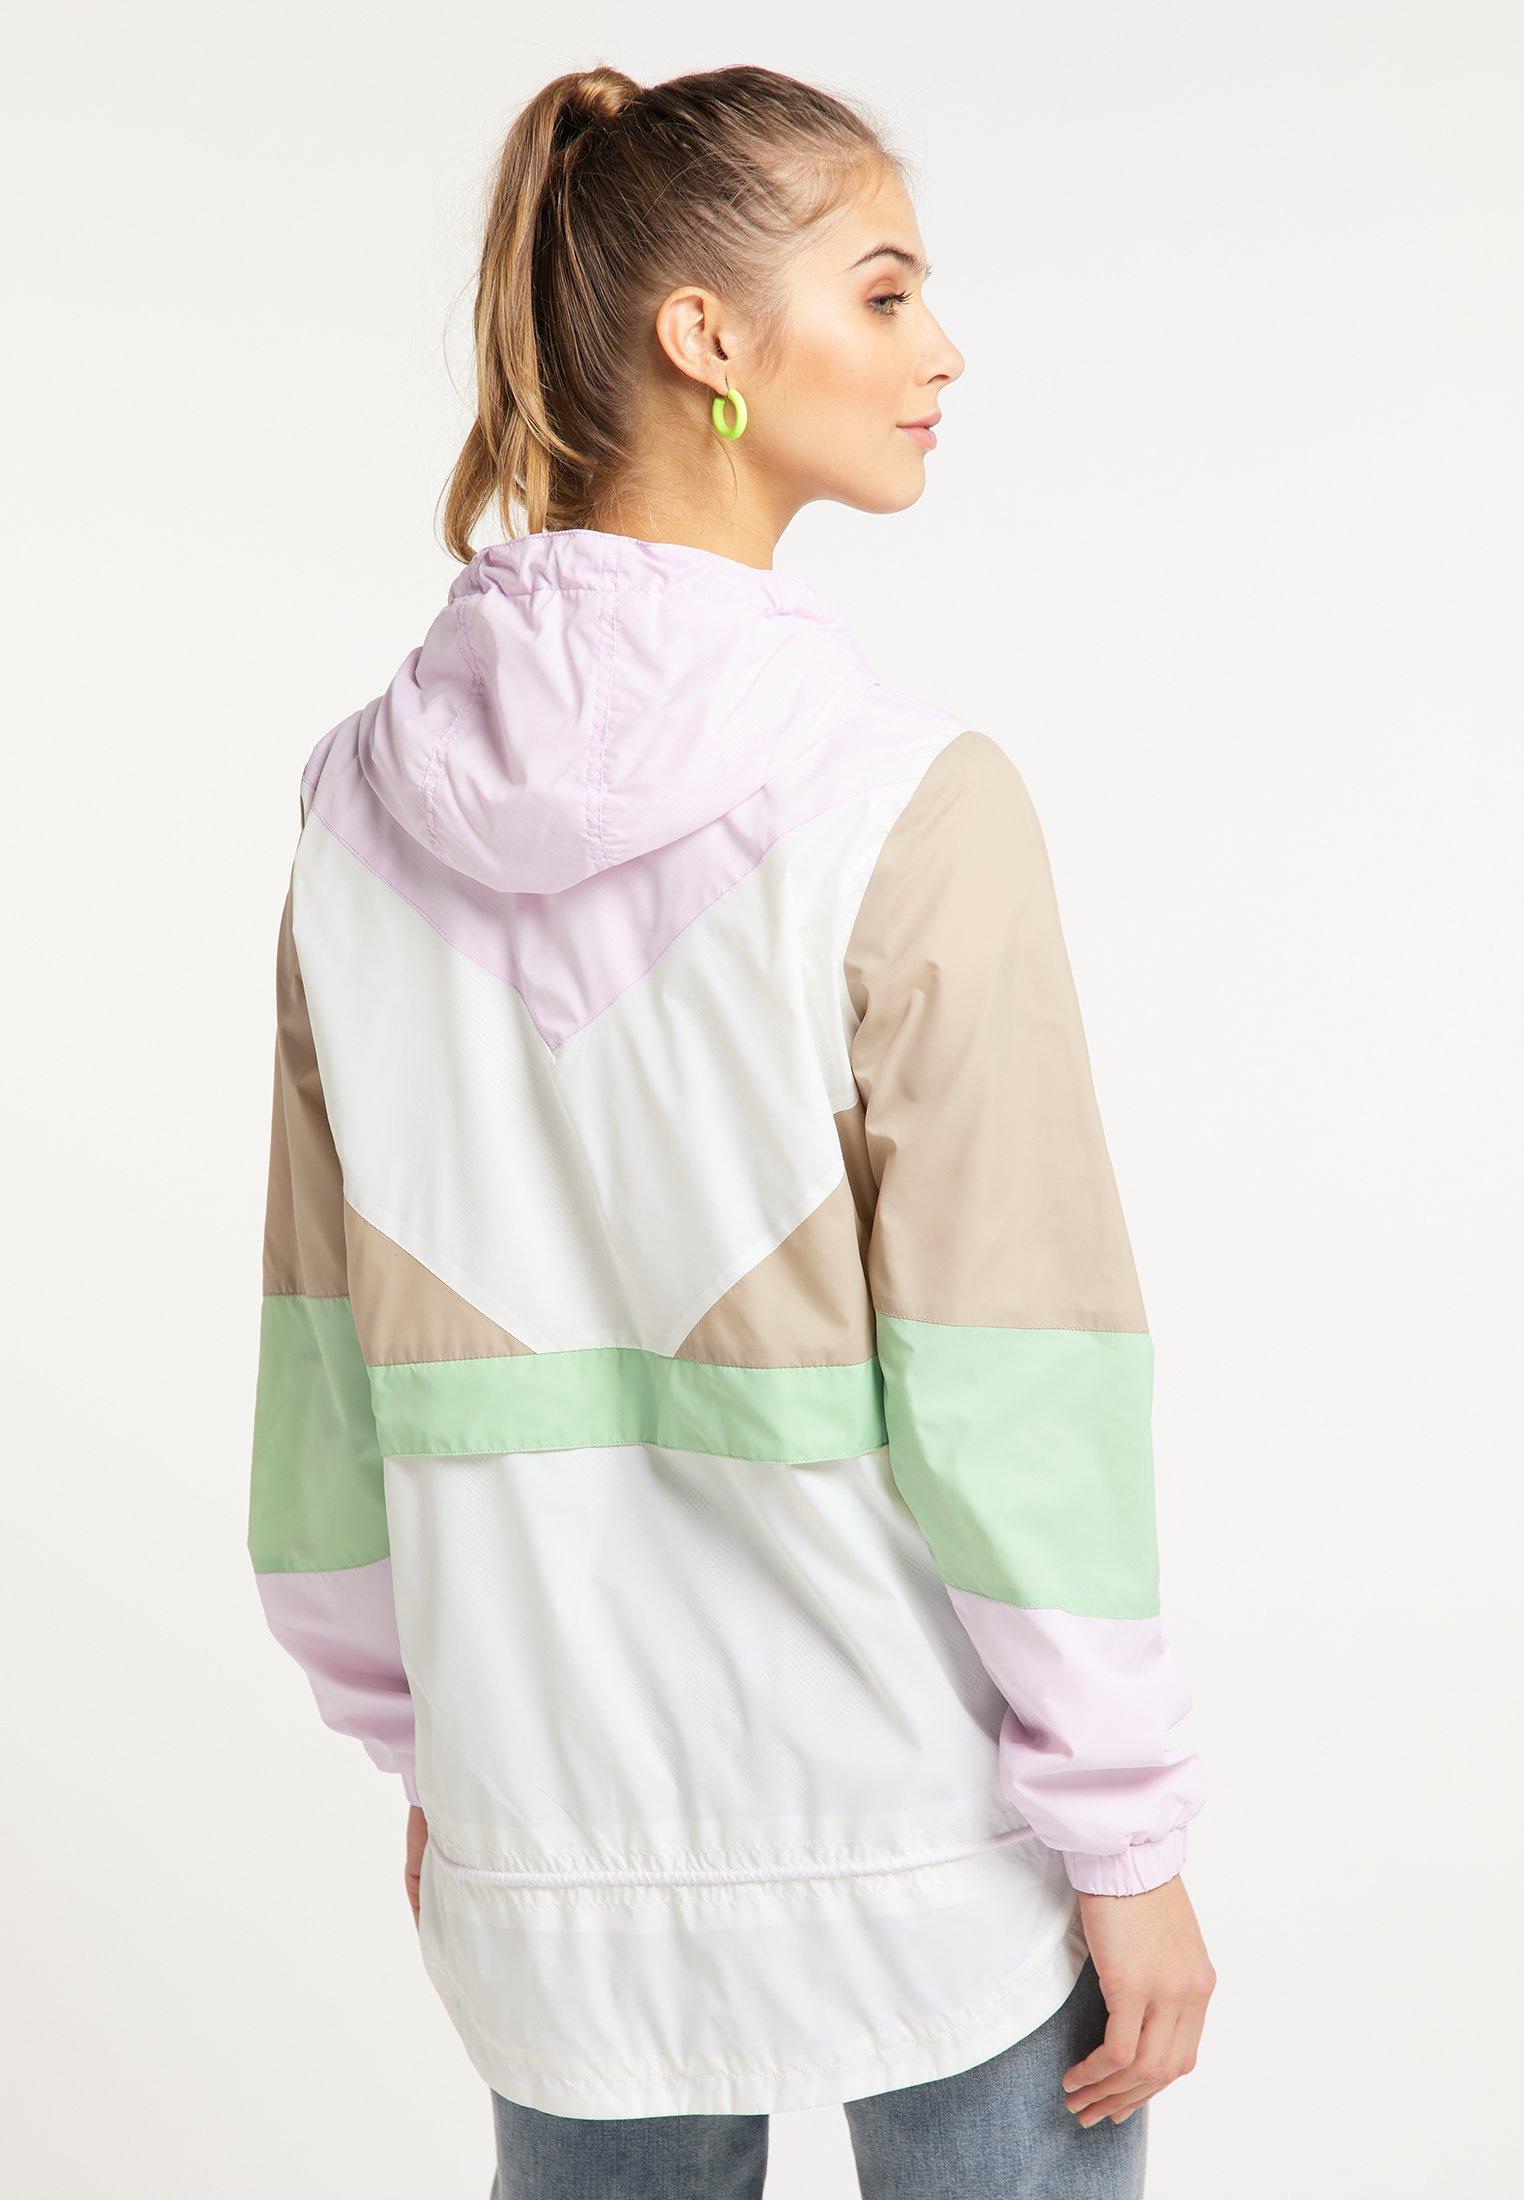 myMo Leichte Jacke light pink/lila